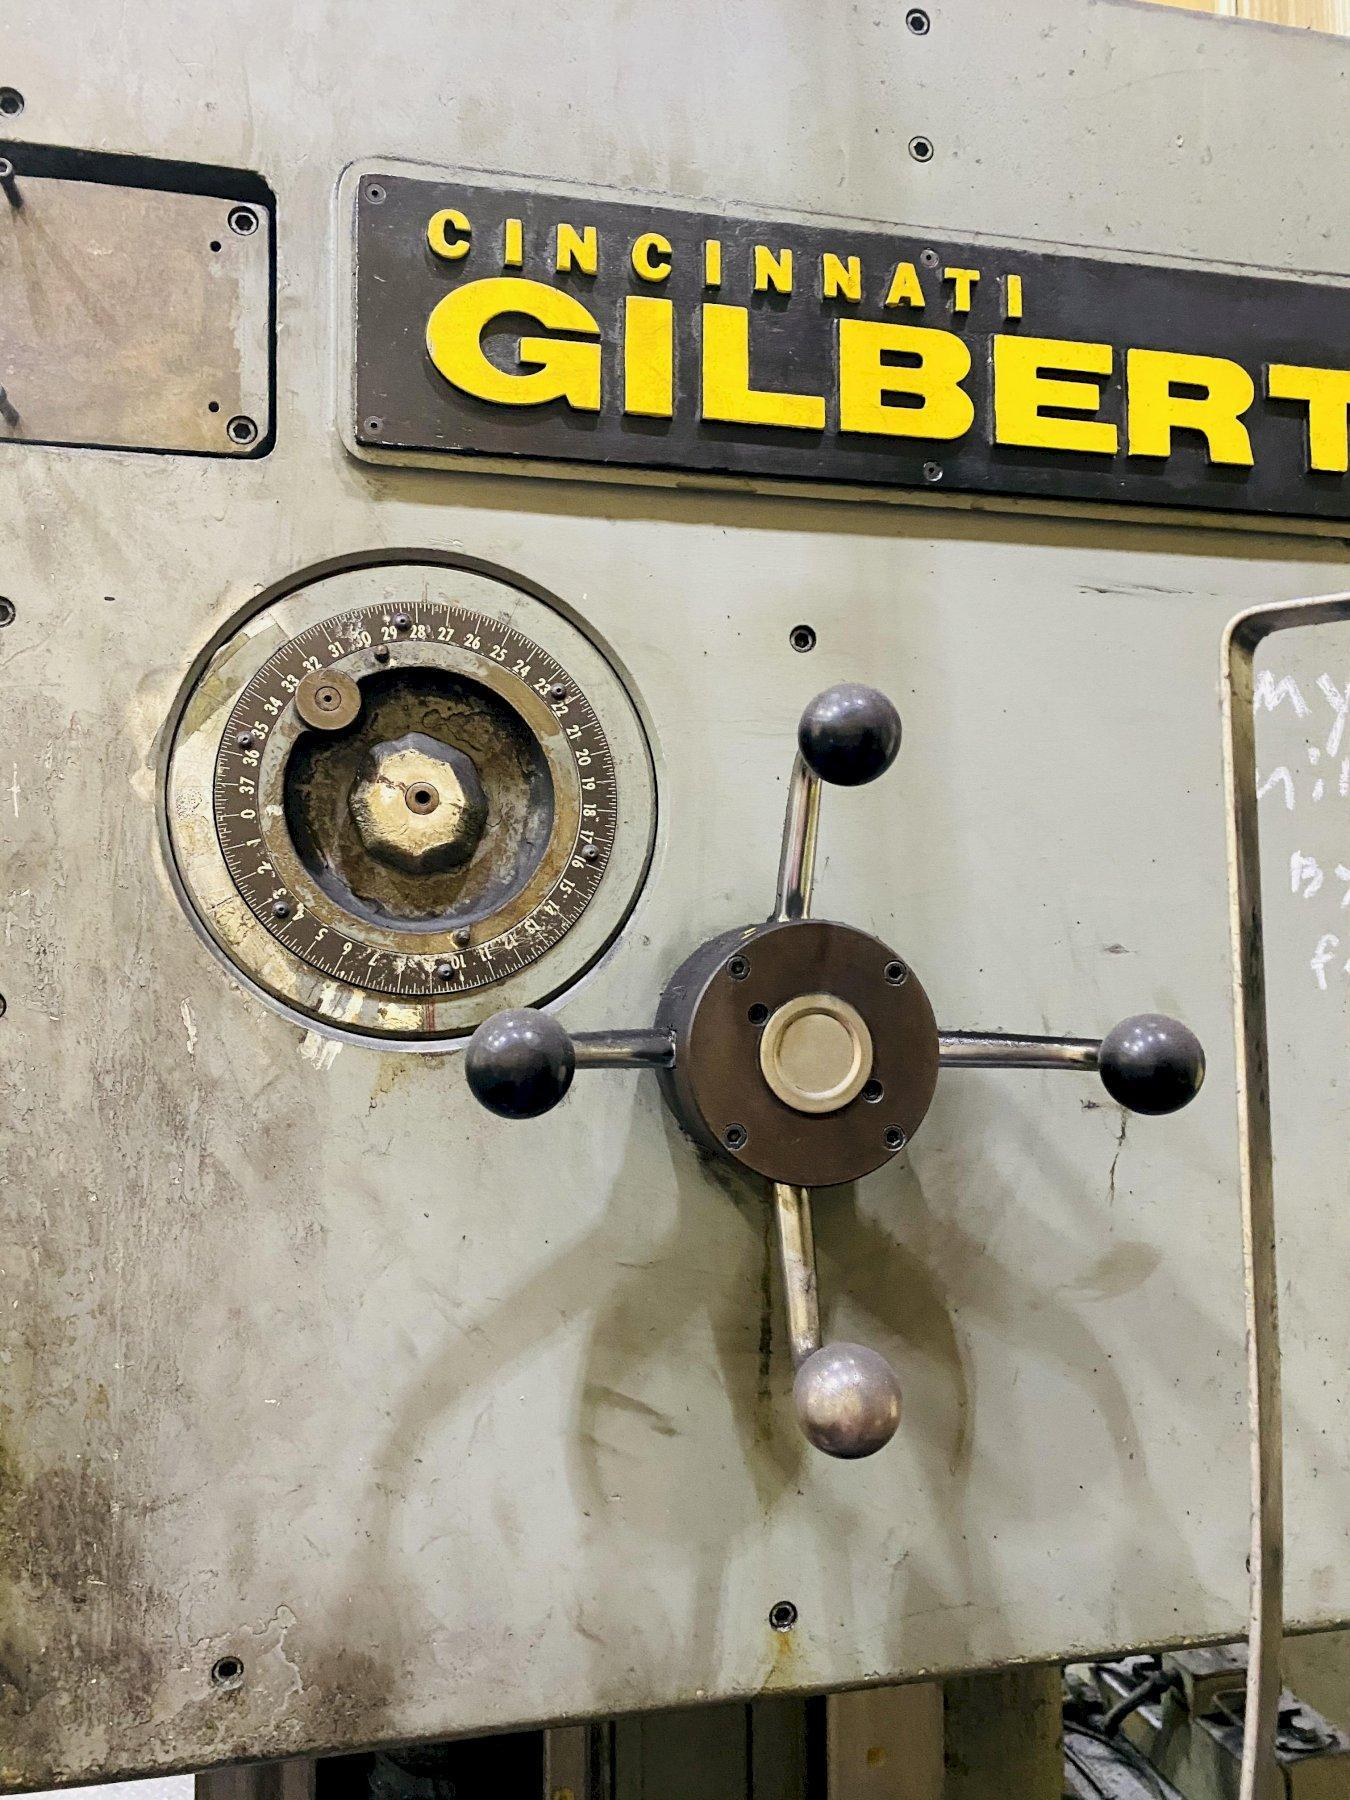 "5"" CINCINNATI GILBERT SERIES 5 TABLE TYPE HORIZONTAL BORING MILL STOCK # 0310621"